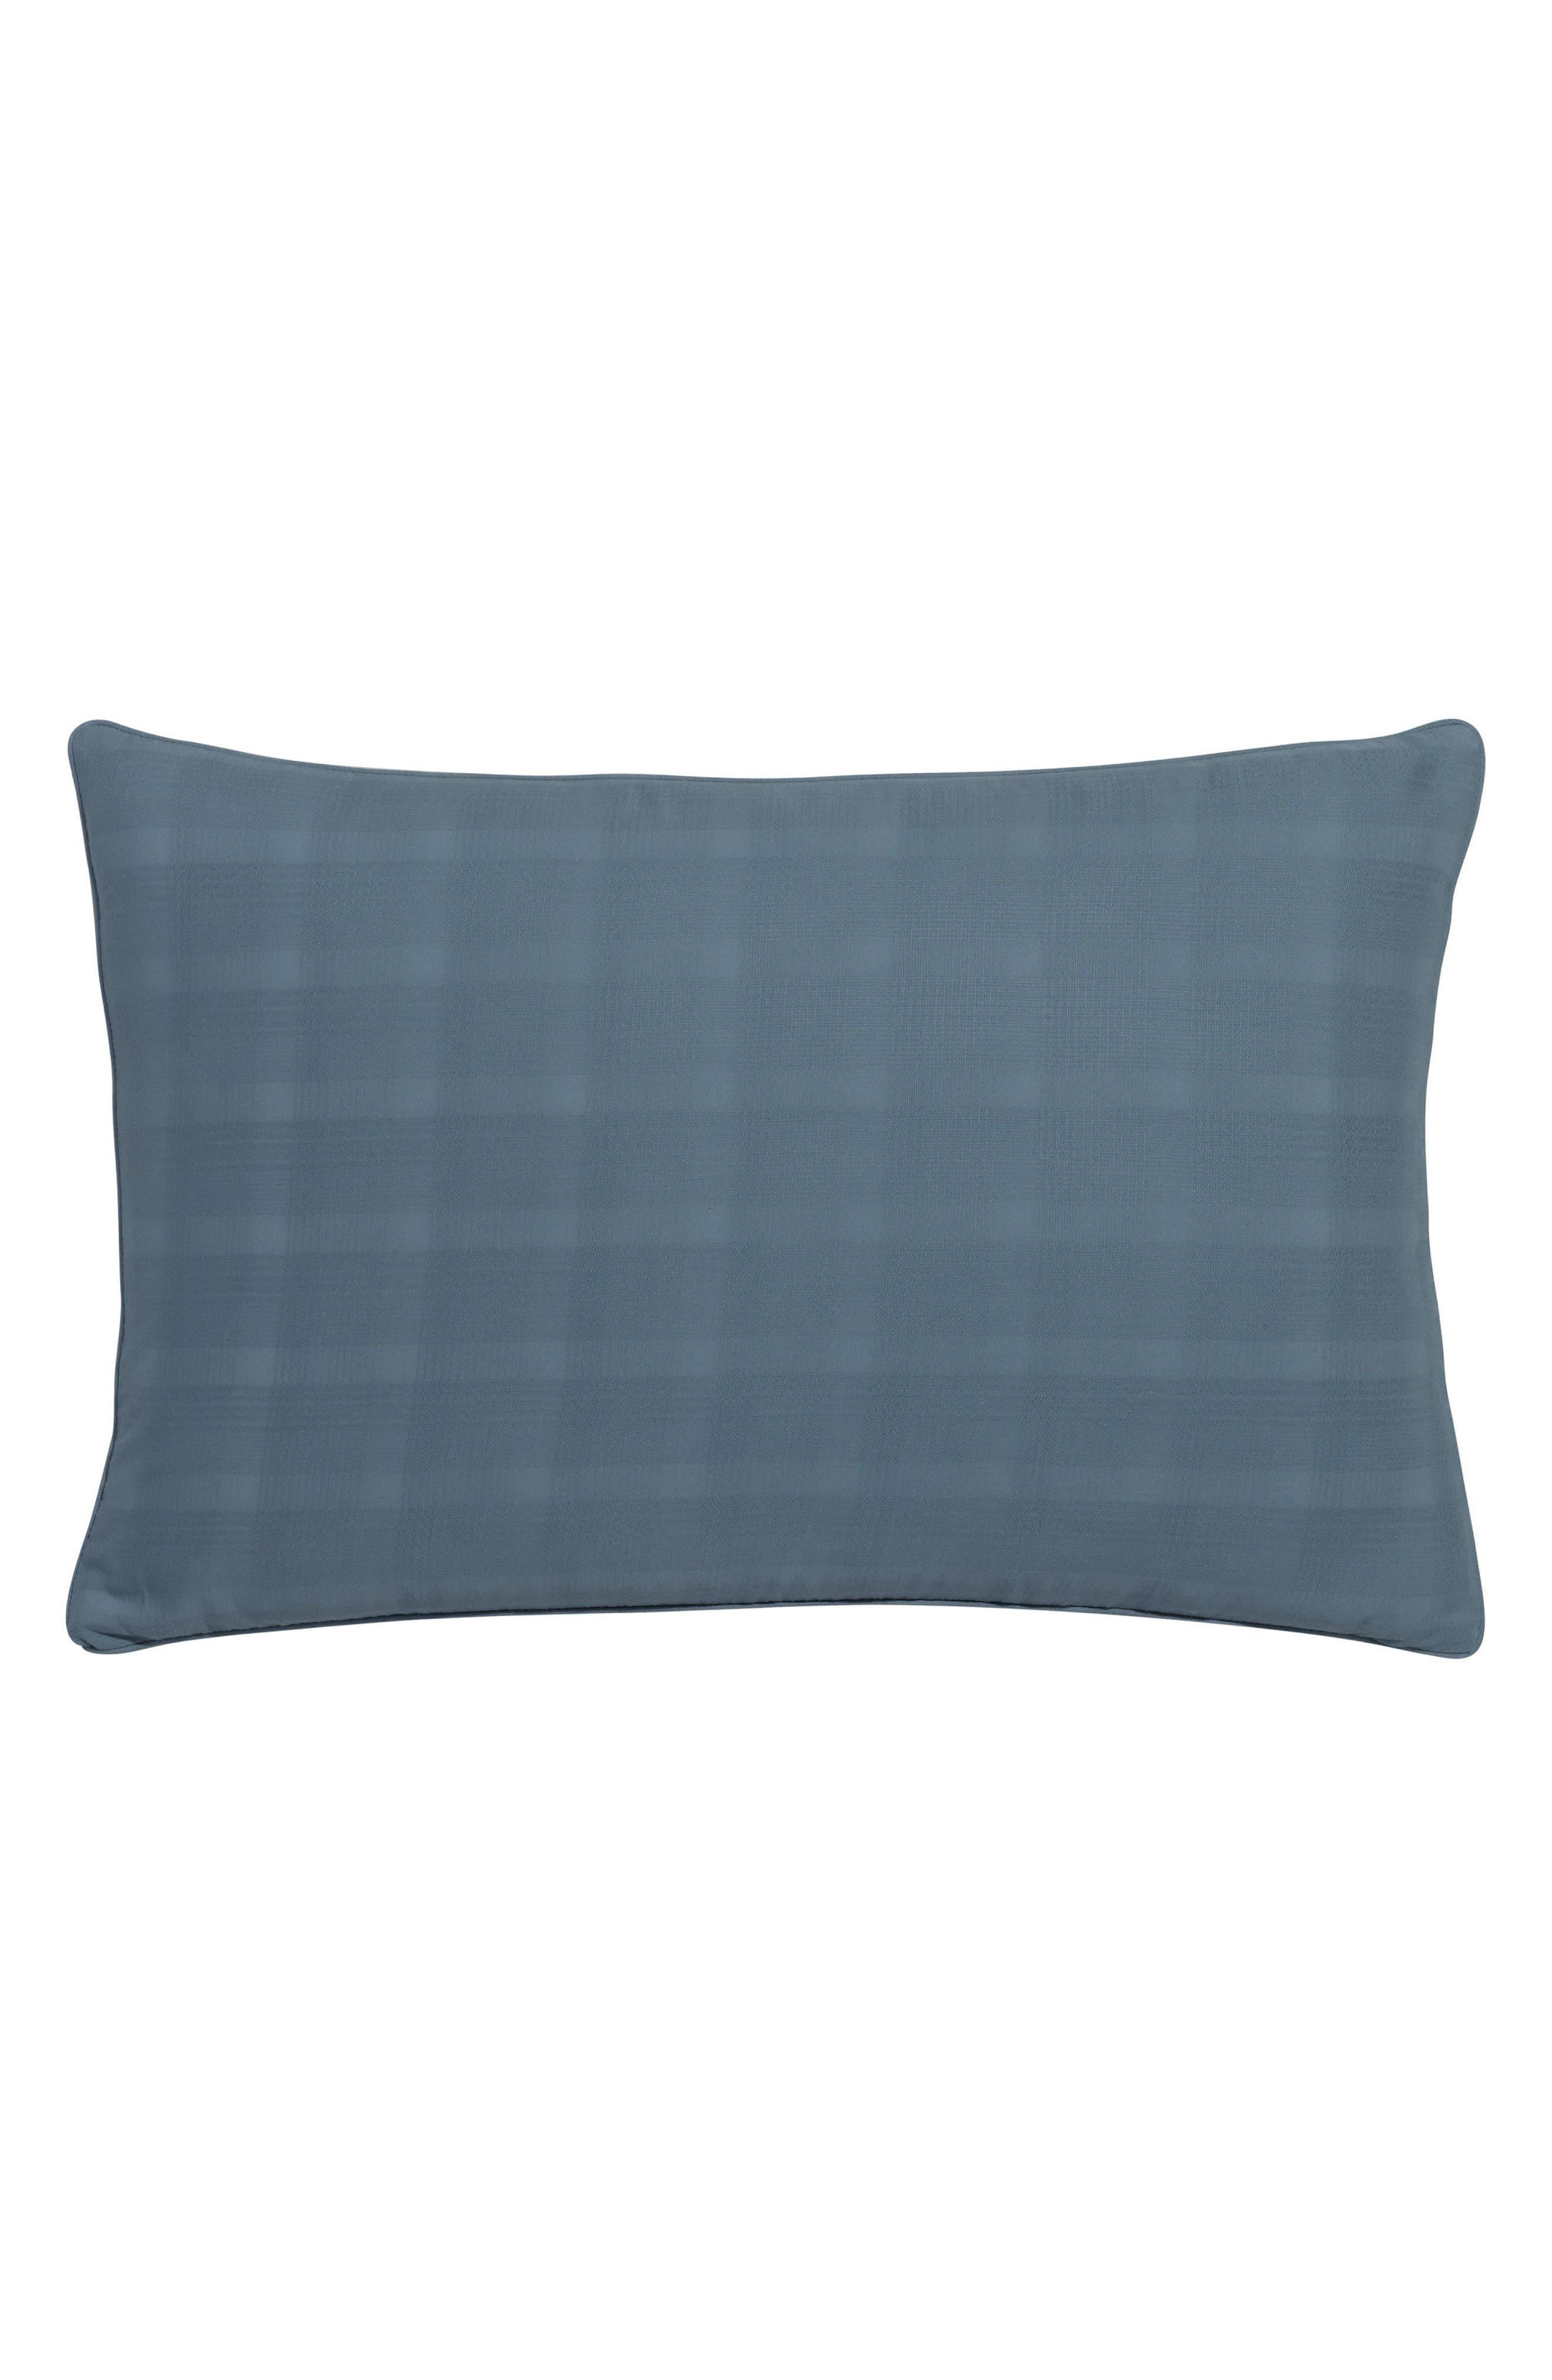 PORTICO Glacier Bay Plaid Accent Pillow